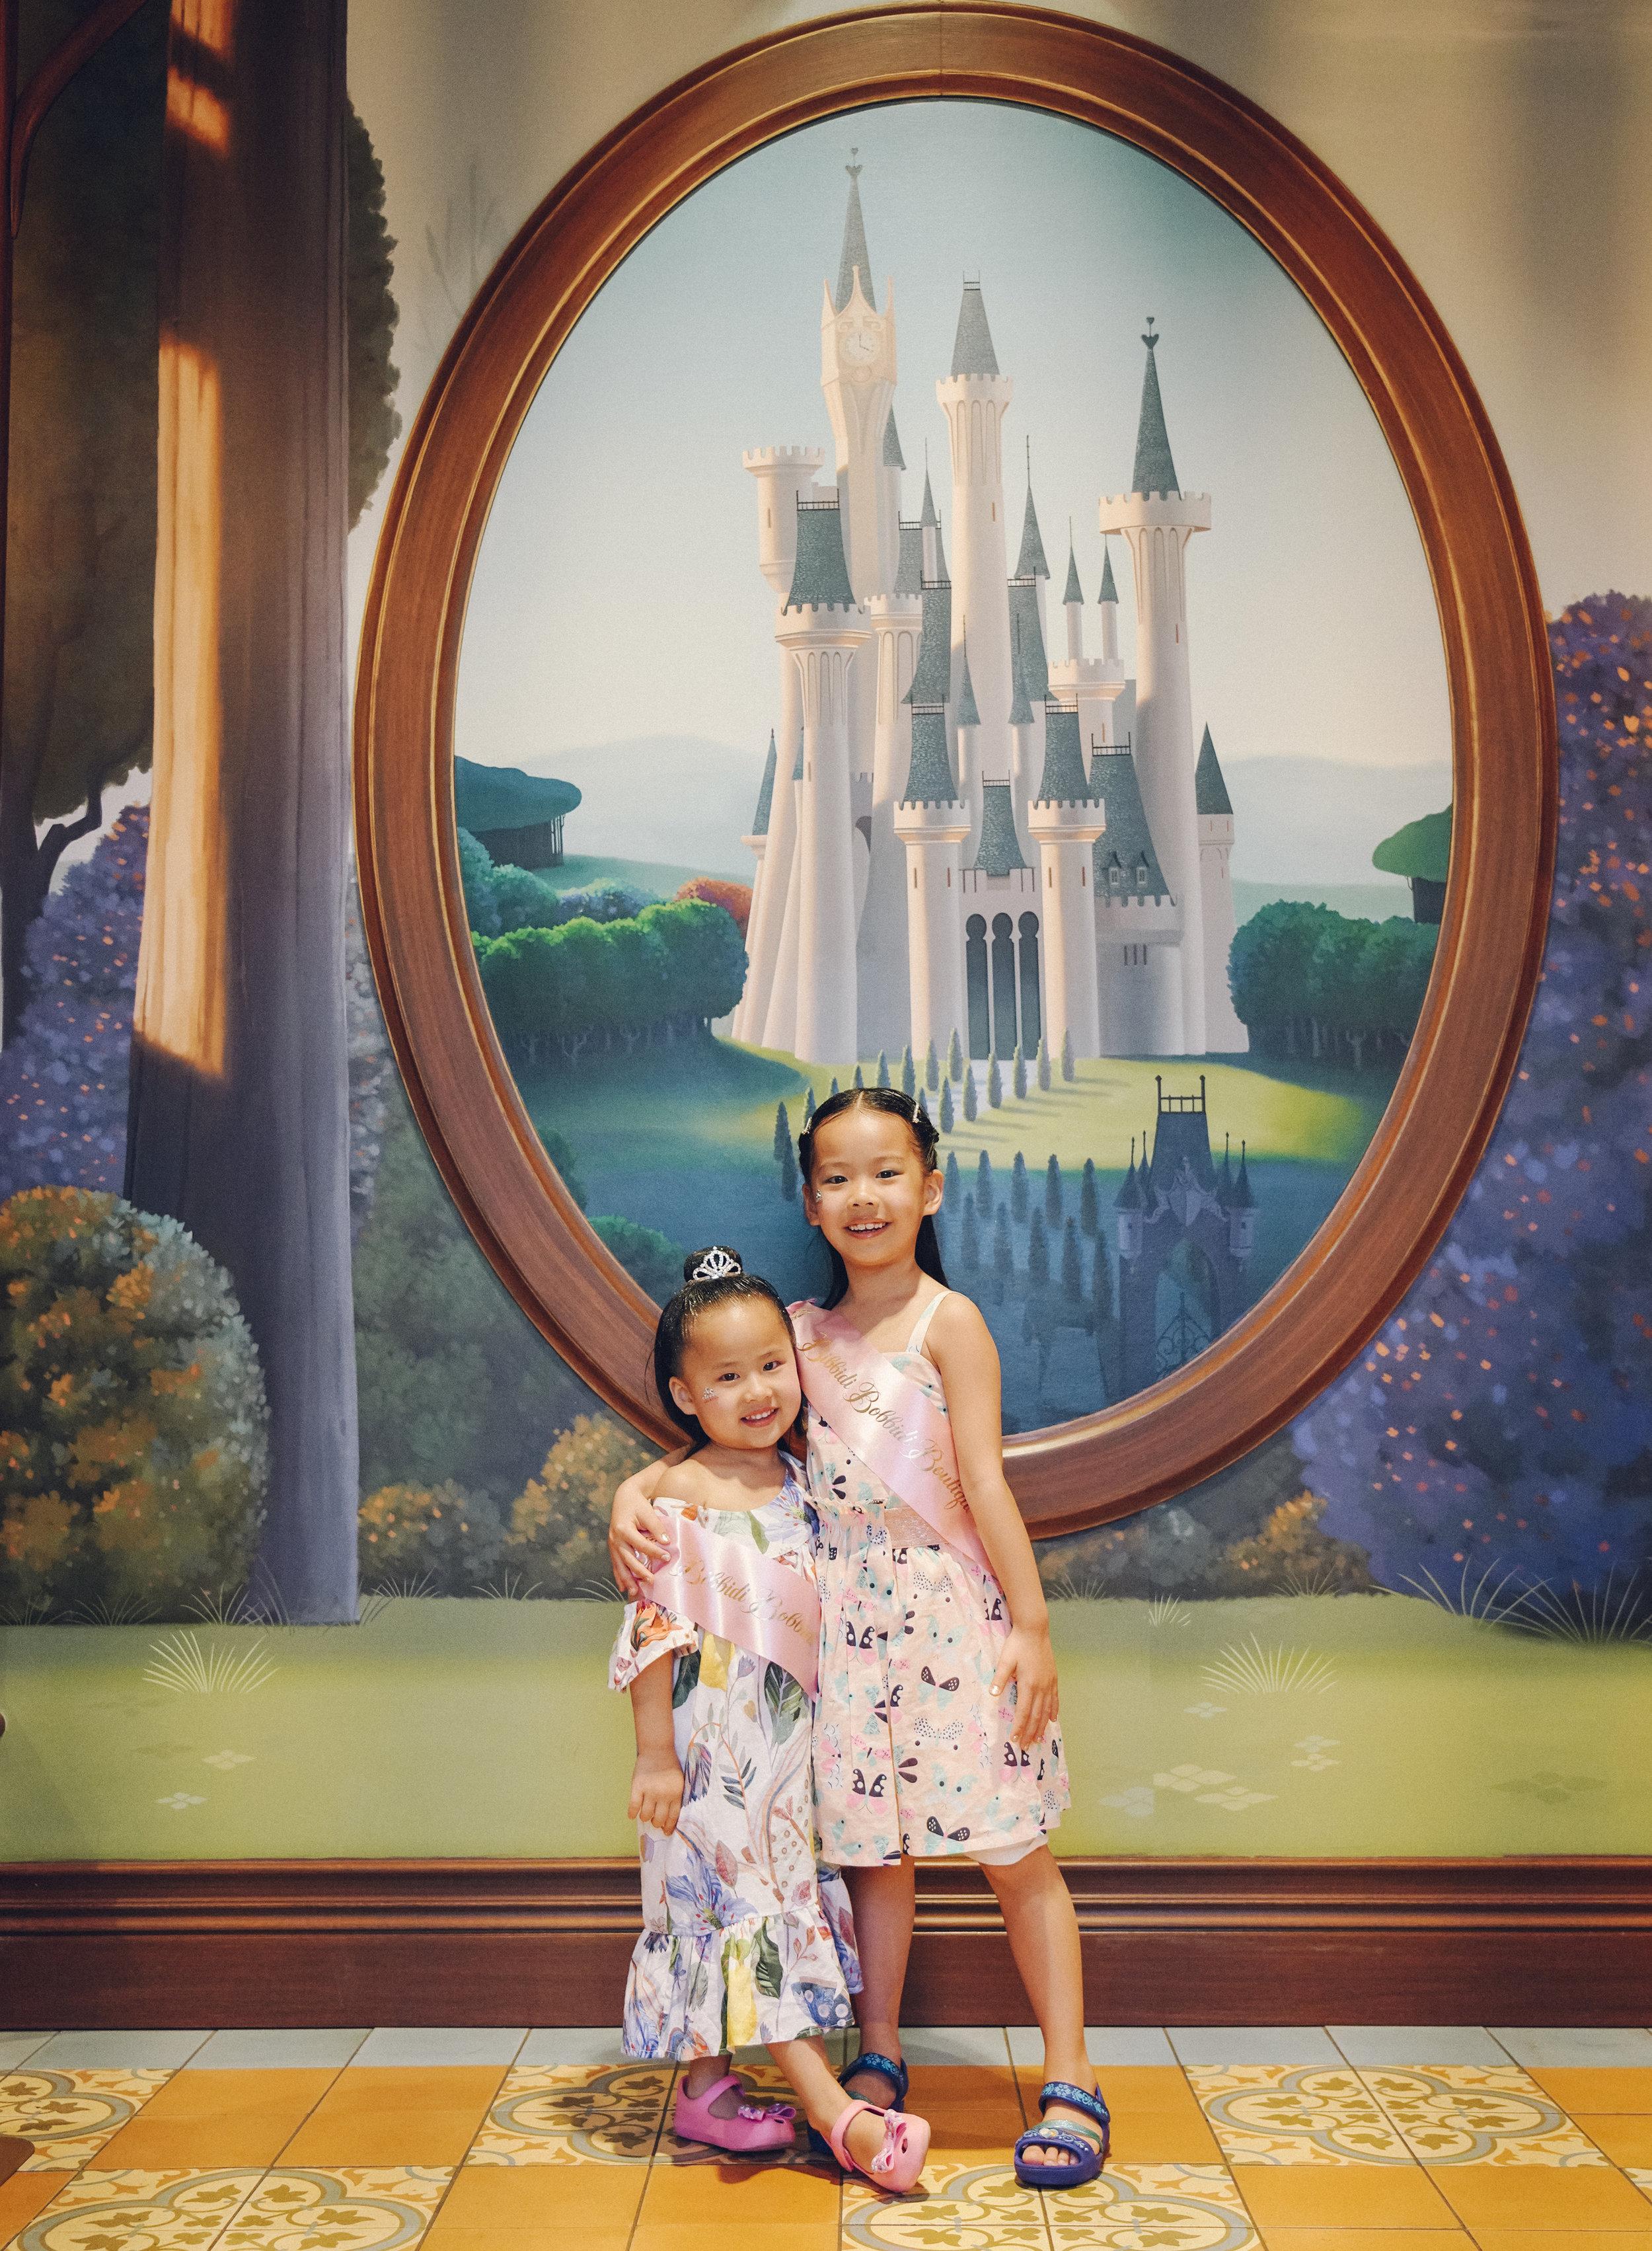 princesses2.jpg